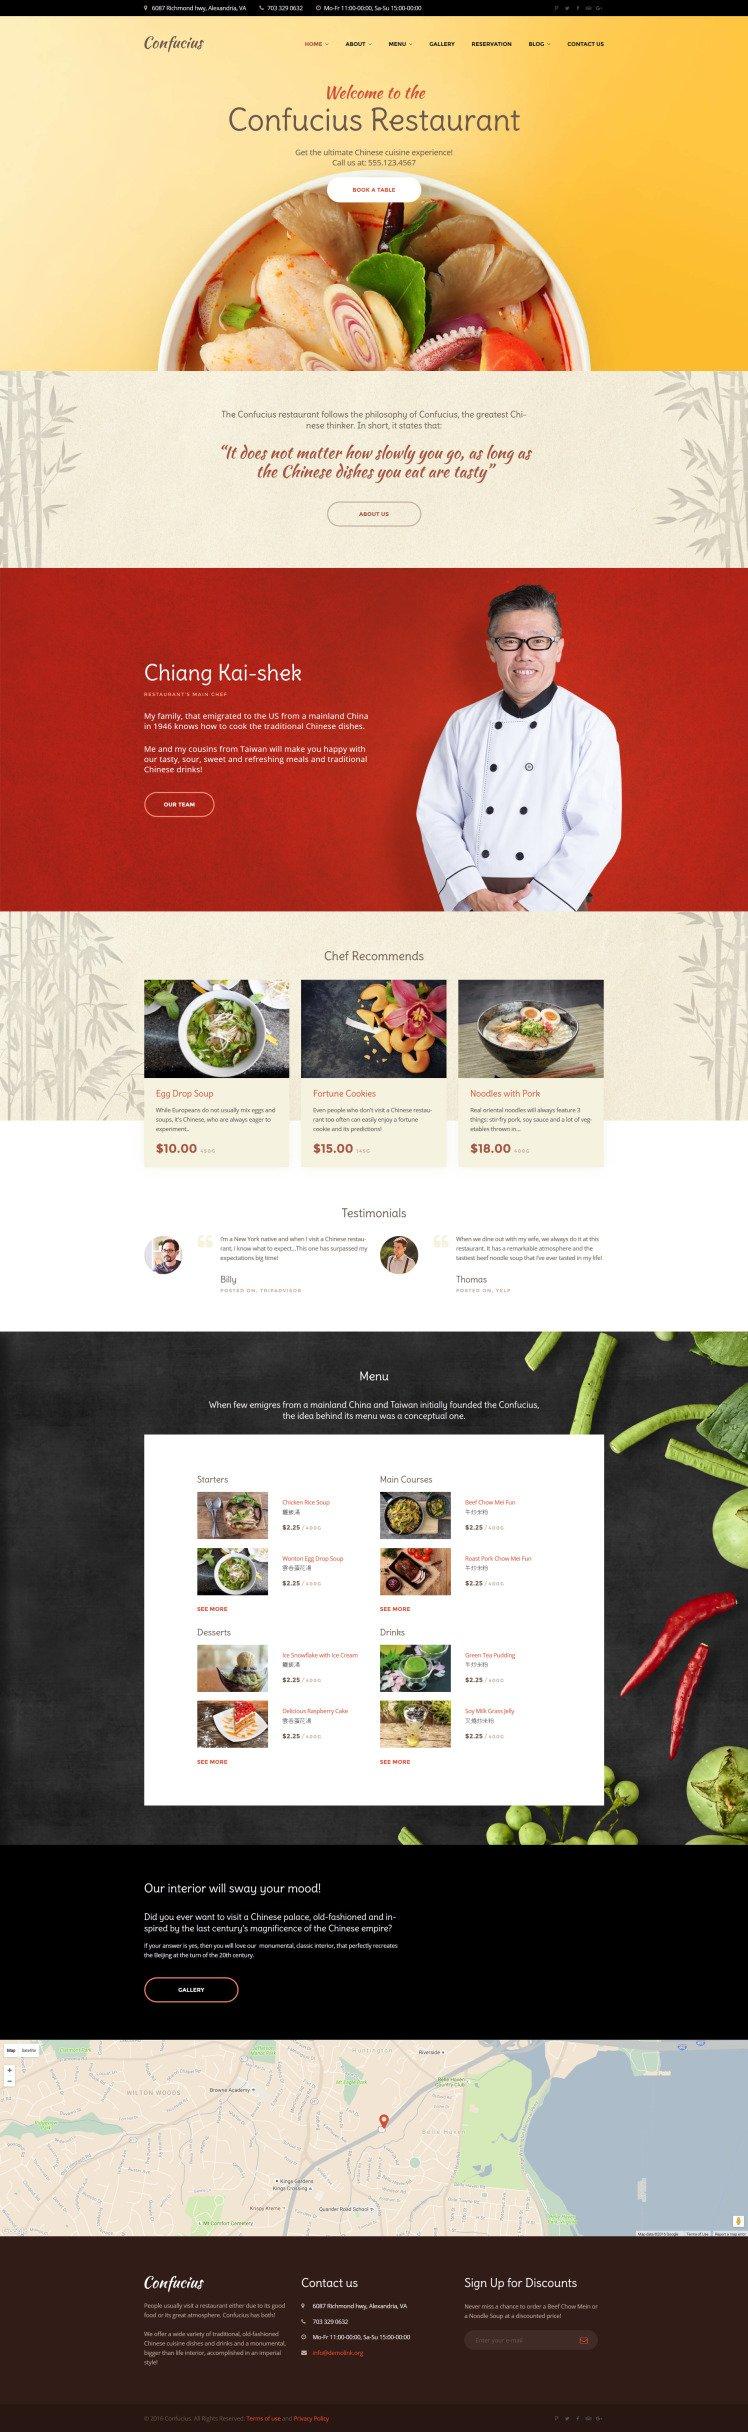 Confucius Chinese Restaurant Responsive WordPress Themes